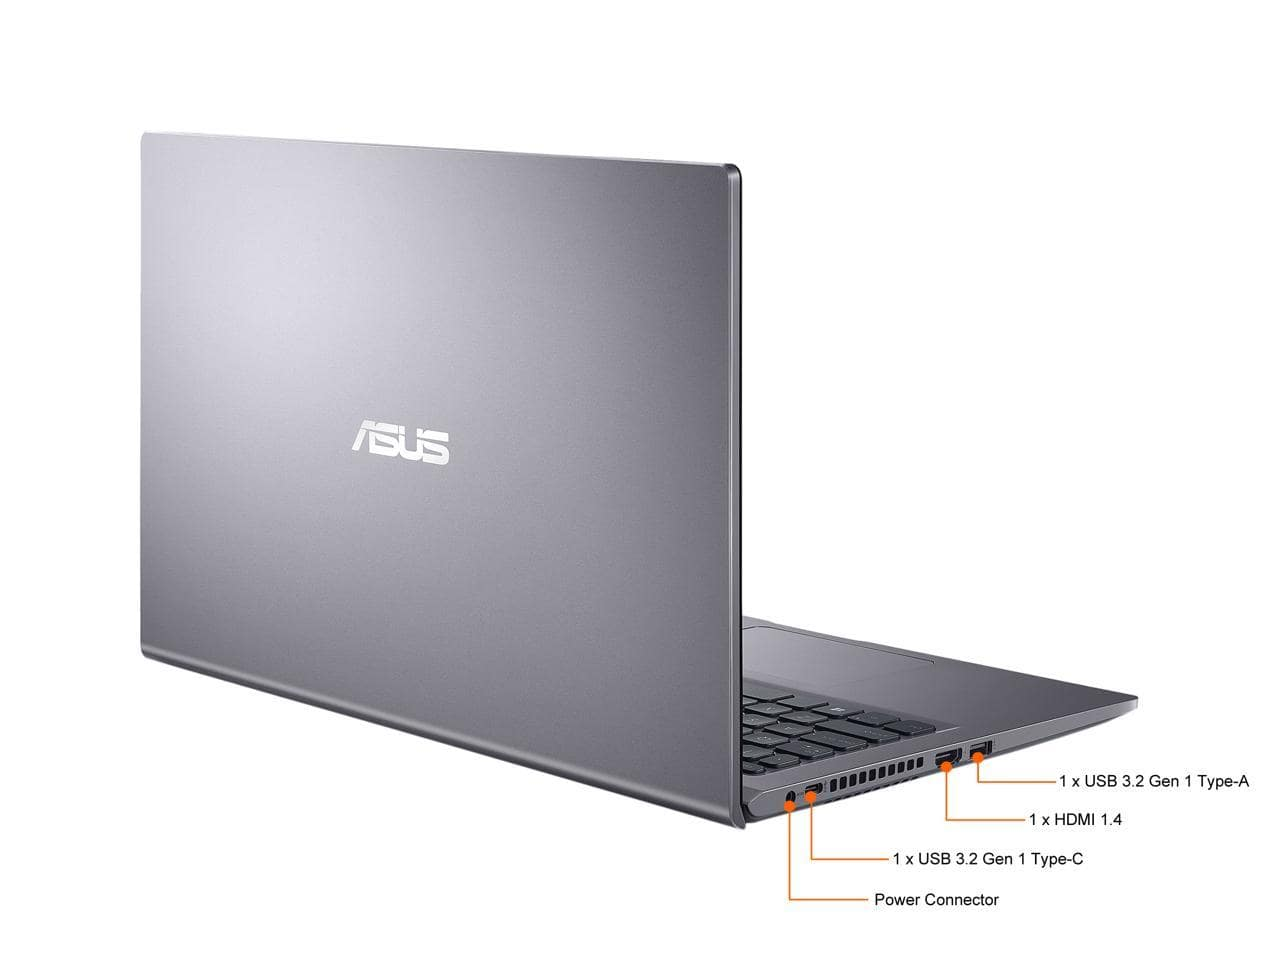 Asus VivoBook M515UA-NS77: 15.6'' FHD IPS, Ryzen 7 5700U, 16GB DDR4, 512GB PCIe SSD, Win10H @ $639.26 incl Shipping (Back Order, ETA 5/14/21)